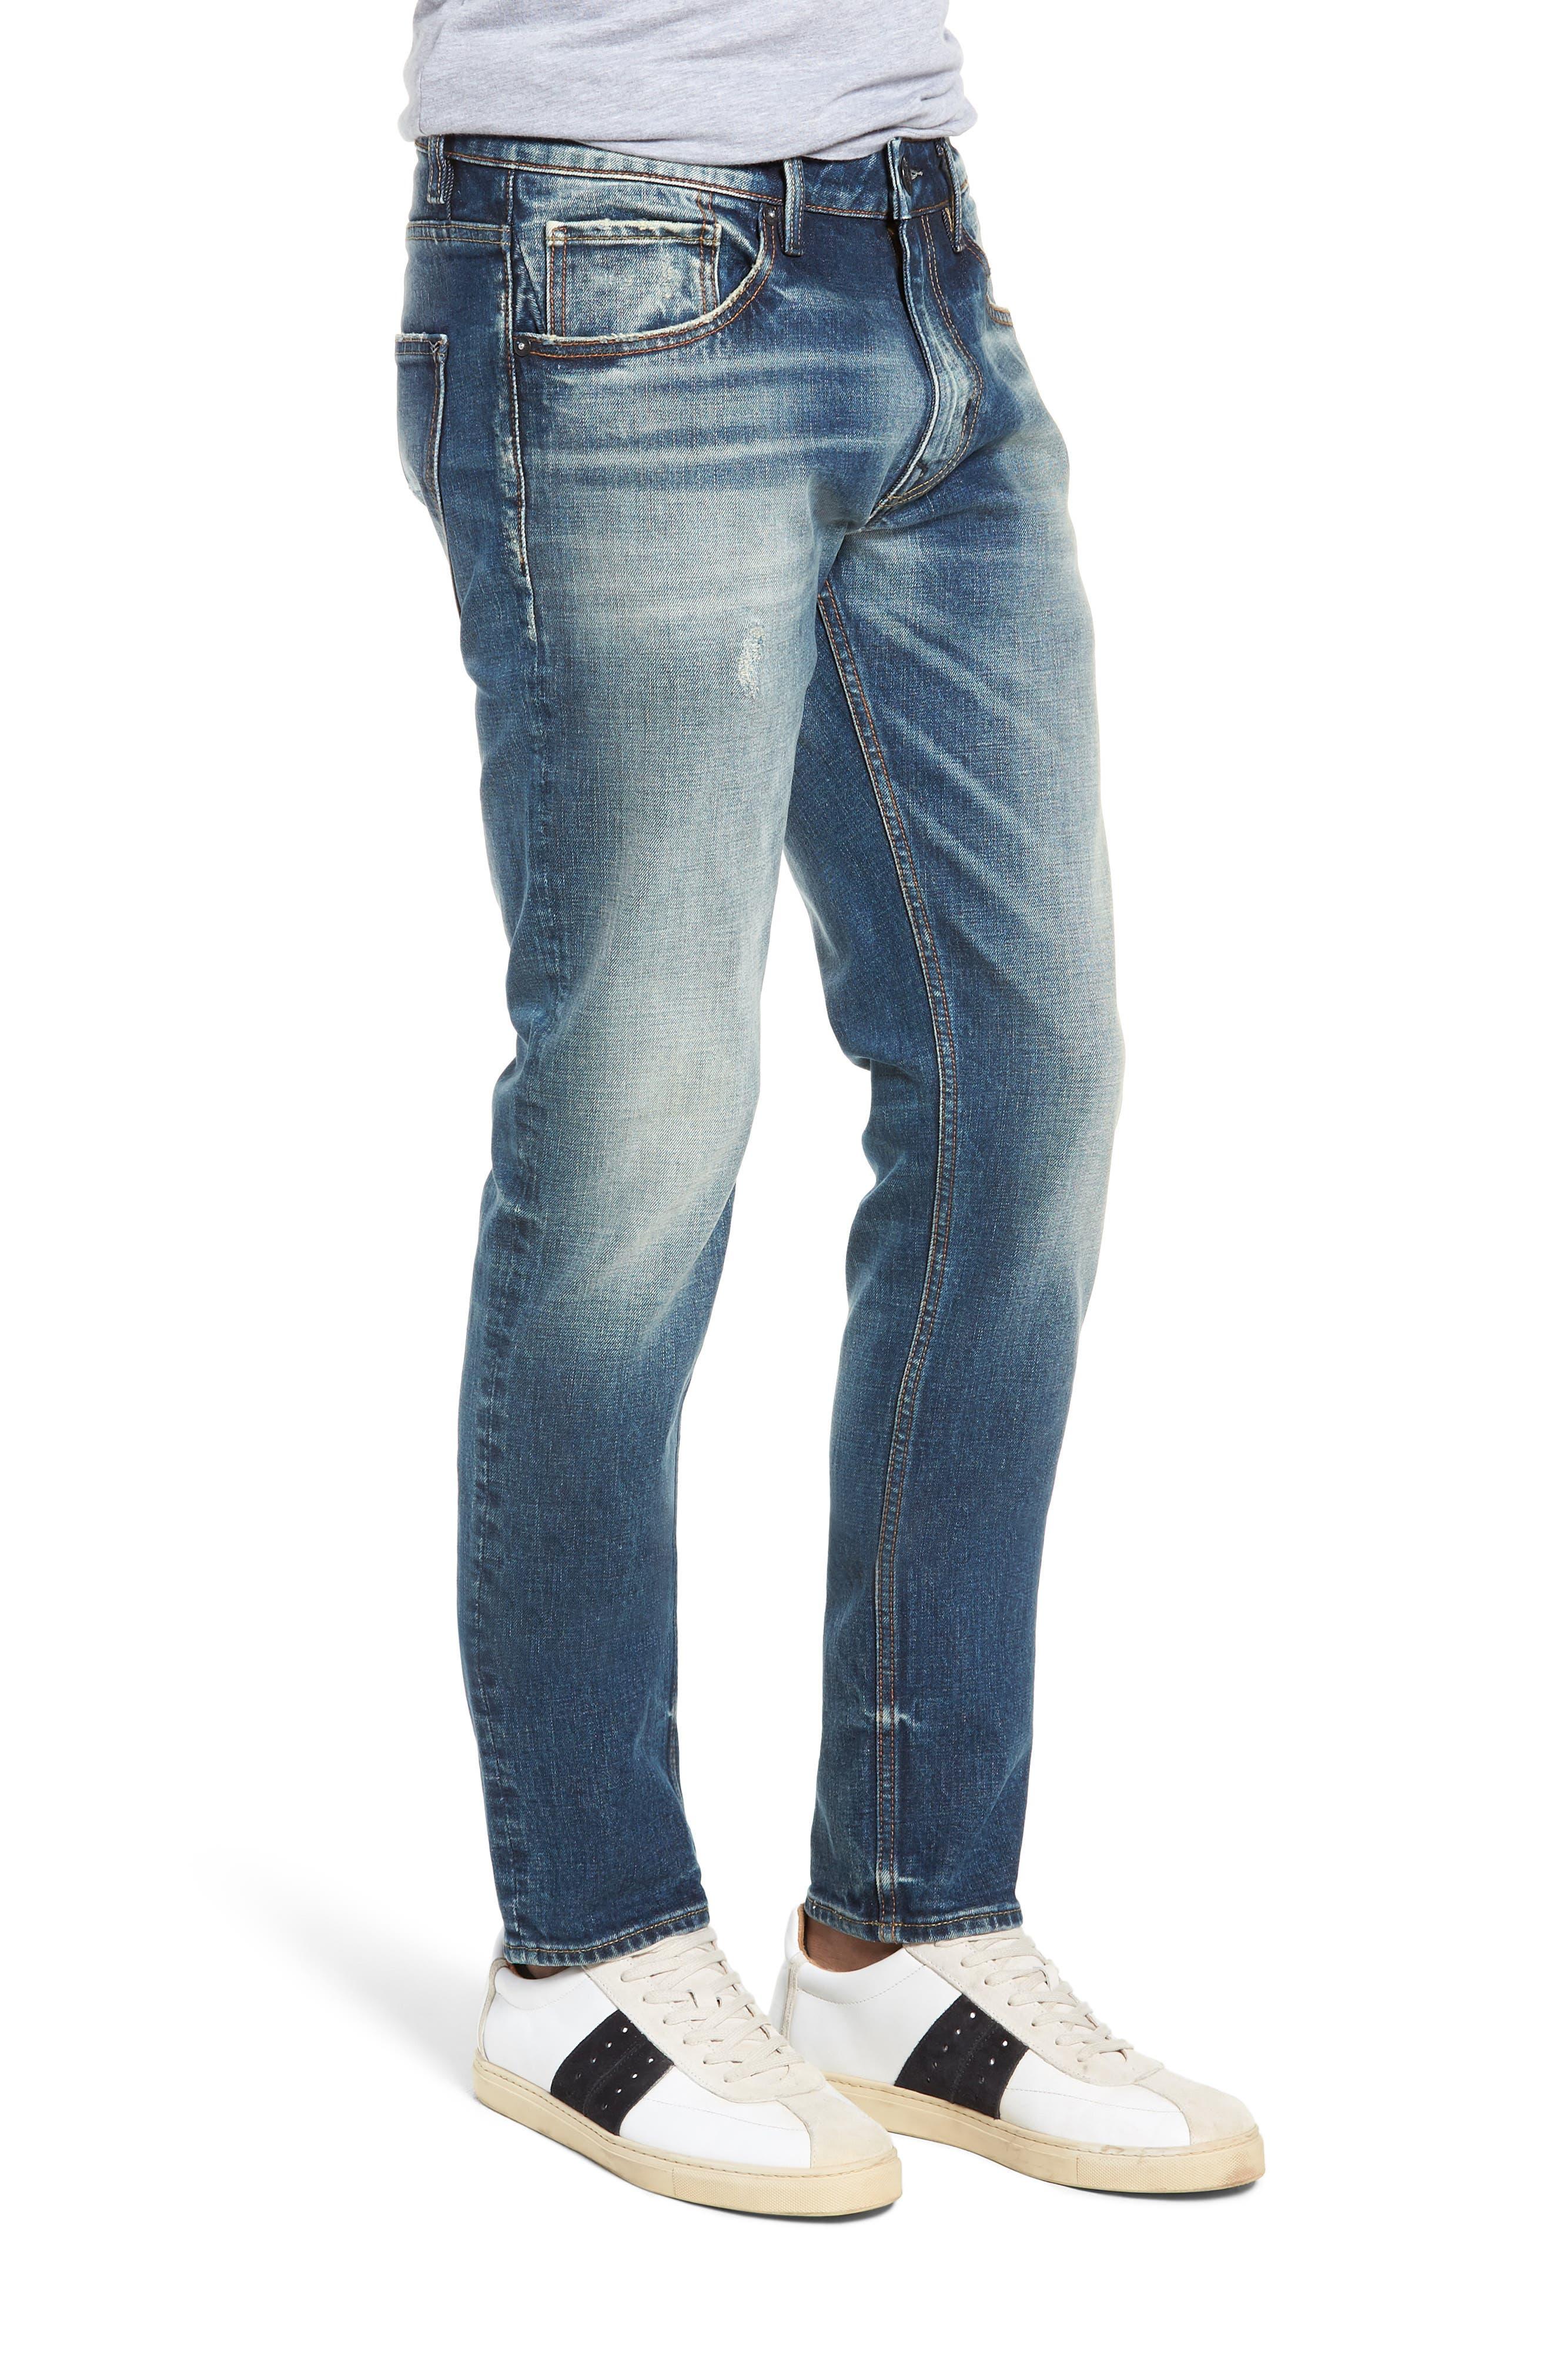 Mick Slim Fit Jeans,                             Alternate thumbnail 3, color,                             VINTAGE WASH